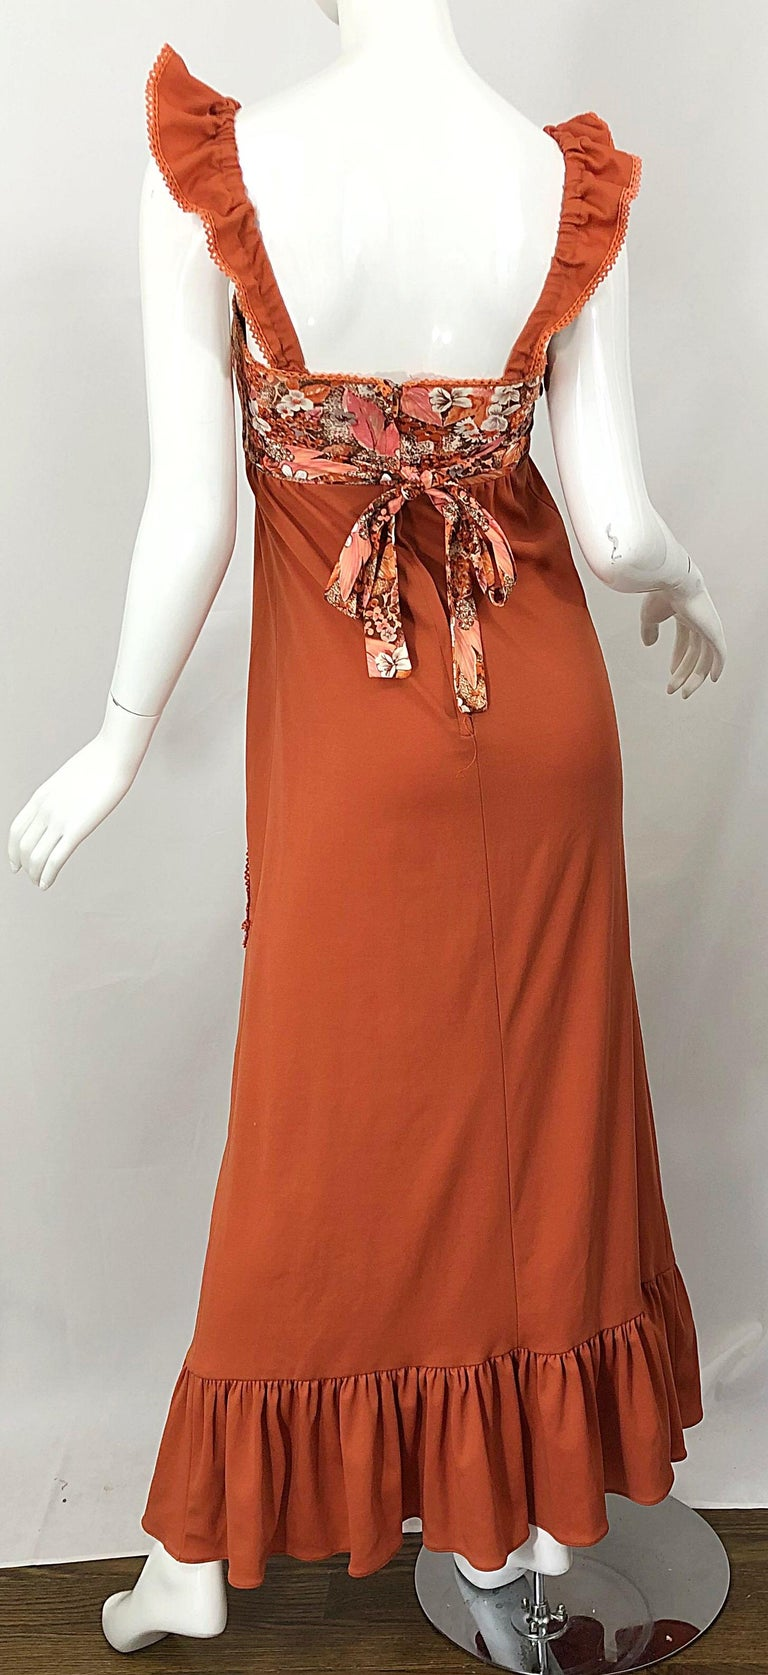 1970s Burnt Orange Patchwork Flowers Boho Vintage 70s Jersey Autumnal Maxi Dress For Sale 6